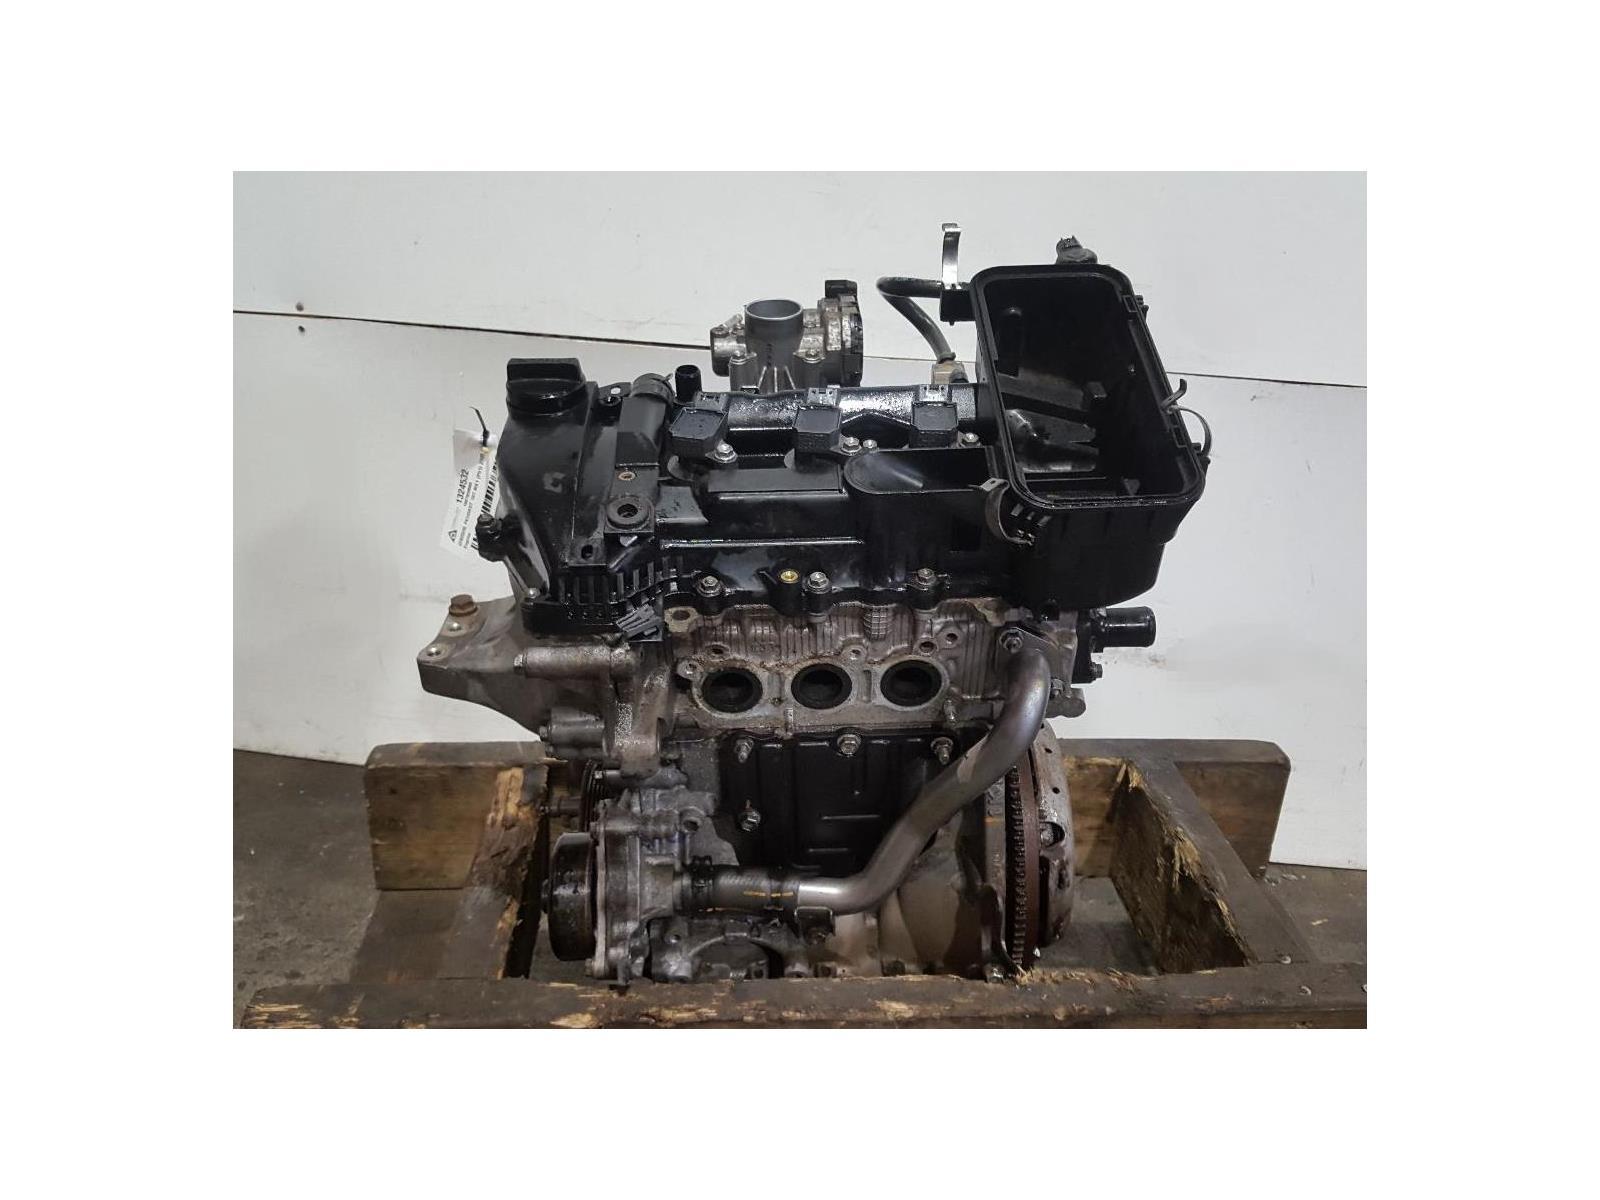 PEUGEOT 107 - MK1 (Ph1) 2005 TO 2013 PETROL - Complete 384F (1KR-FE) Engine